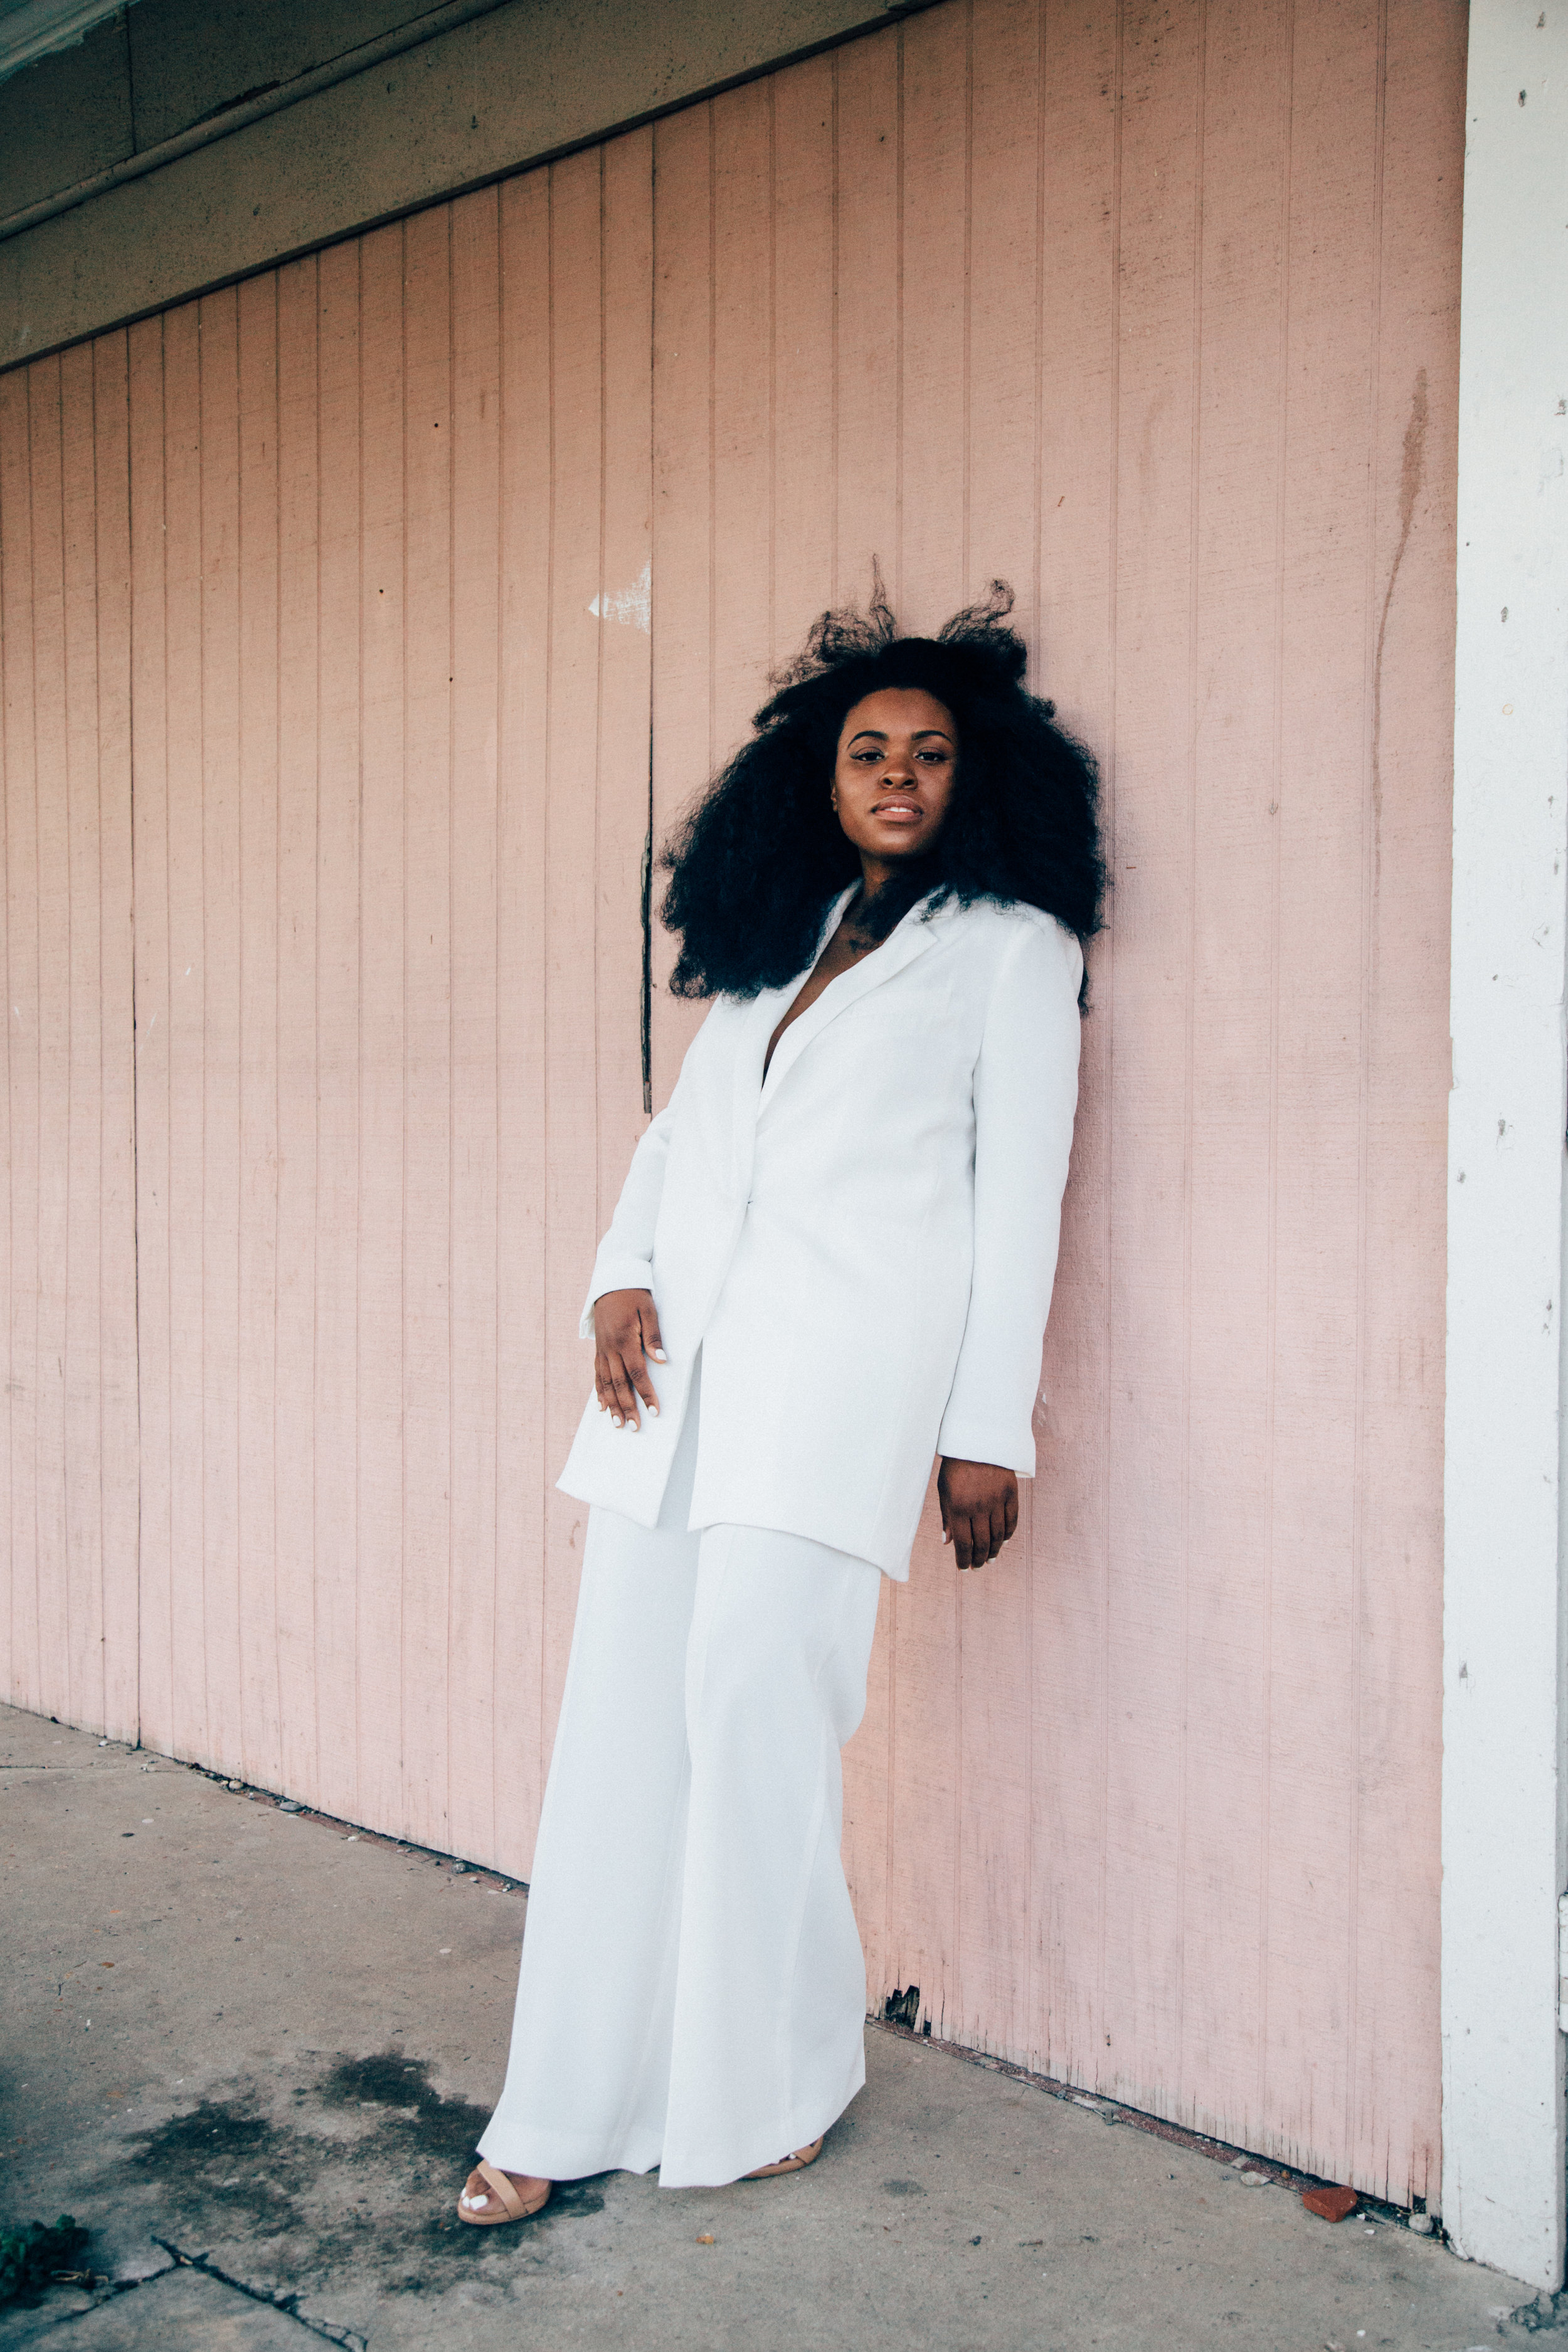 #TLMUSE03STEVONA ELEM-ROGERS - BLACK WOMEN ARE FOR GROWN UPSCreator | Activist | WriterNEW ORLEANS